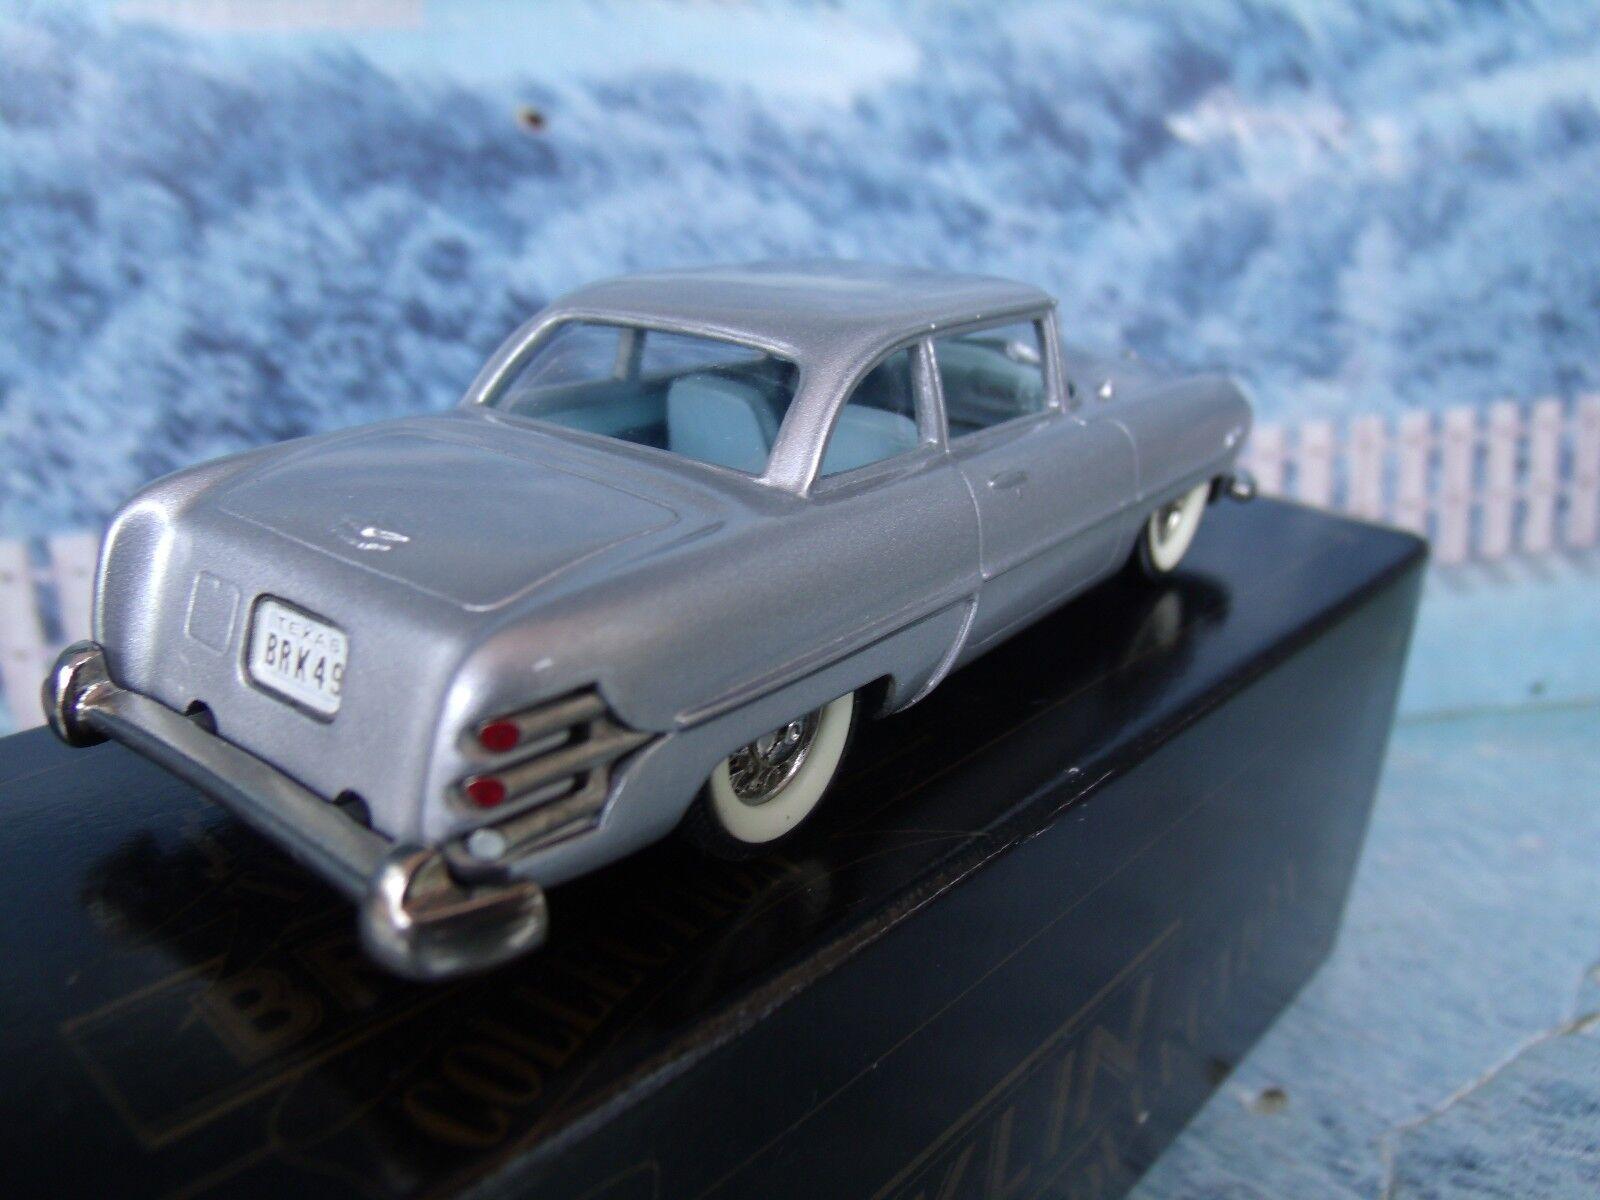 1 43 Brooklin models  Hudson Italia Italia Italia 1954 BRK.49  white metal model d6a255